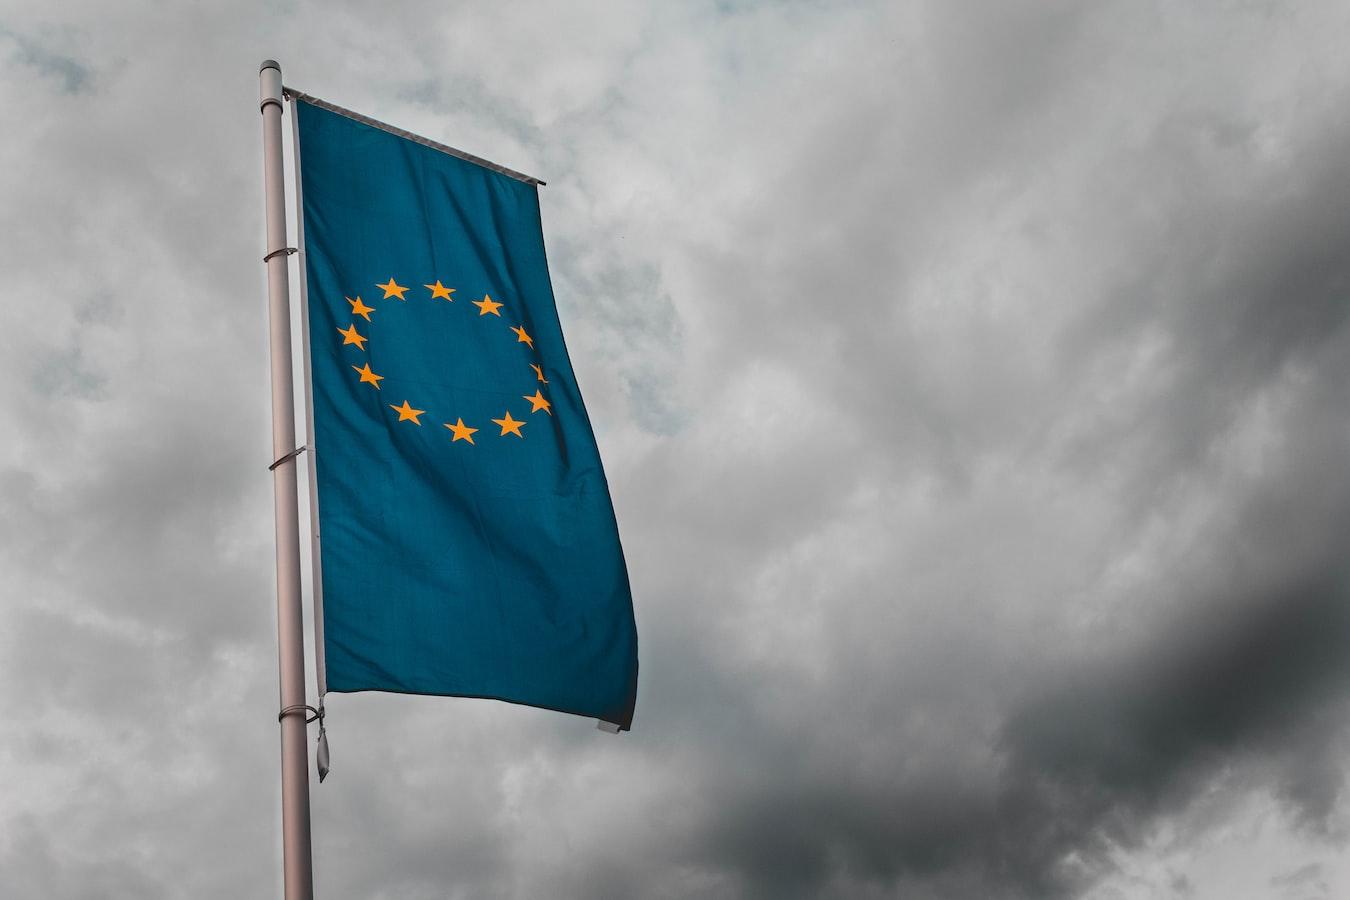 bandiera europea con nubi